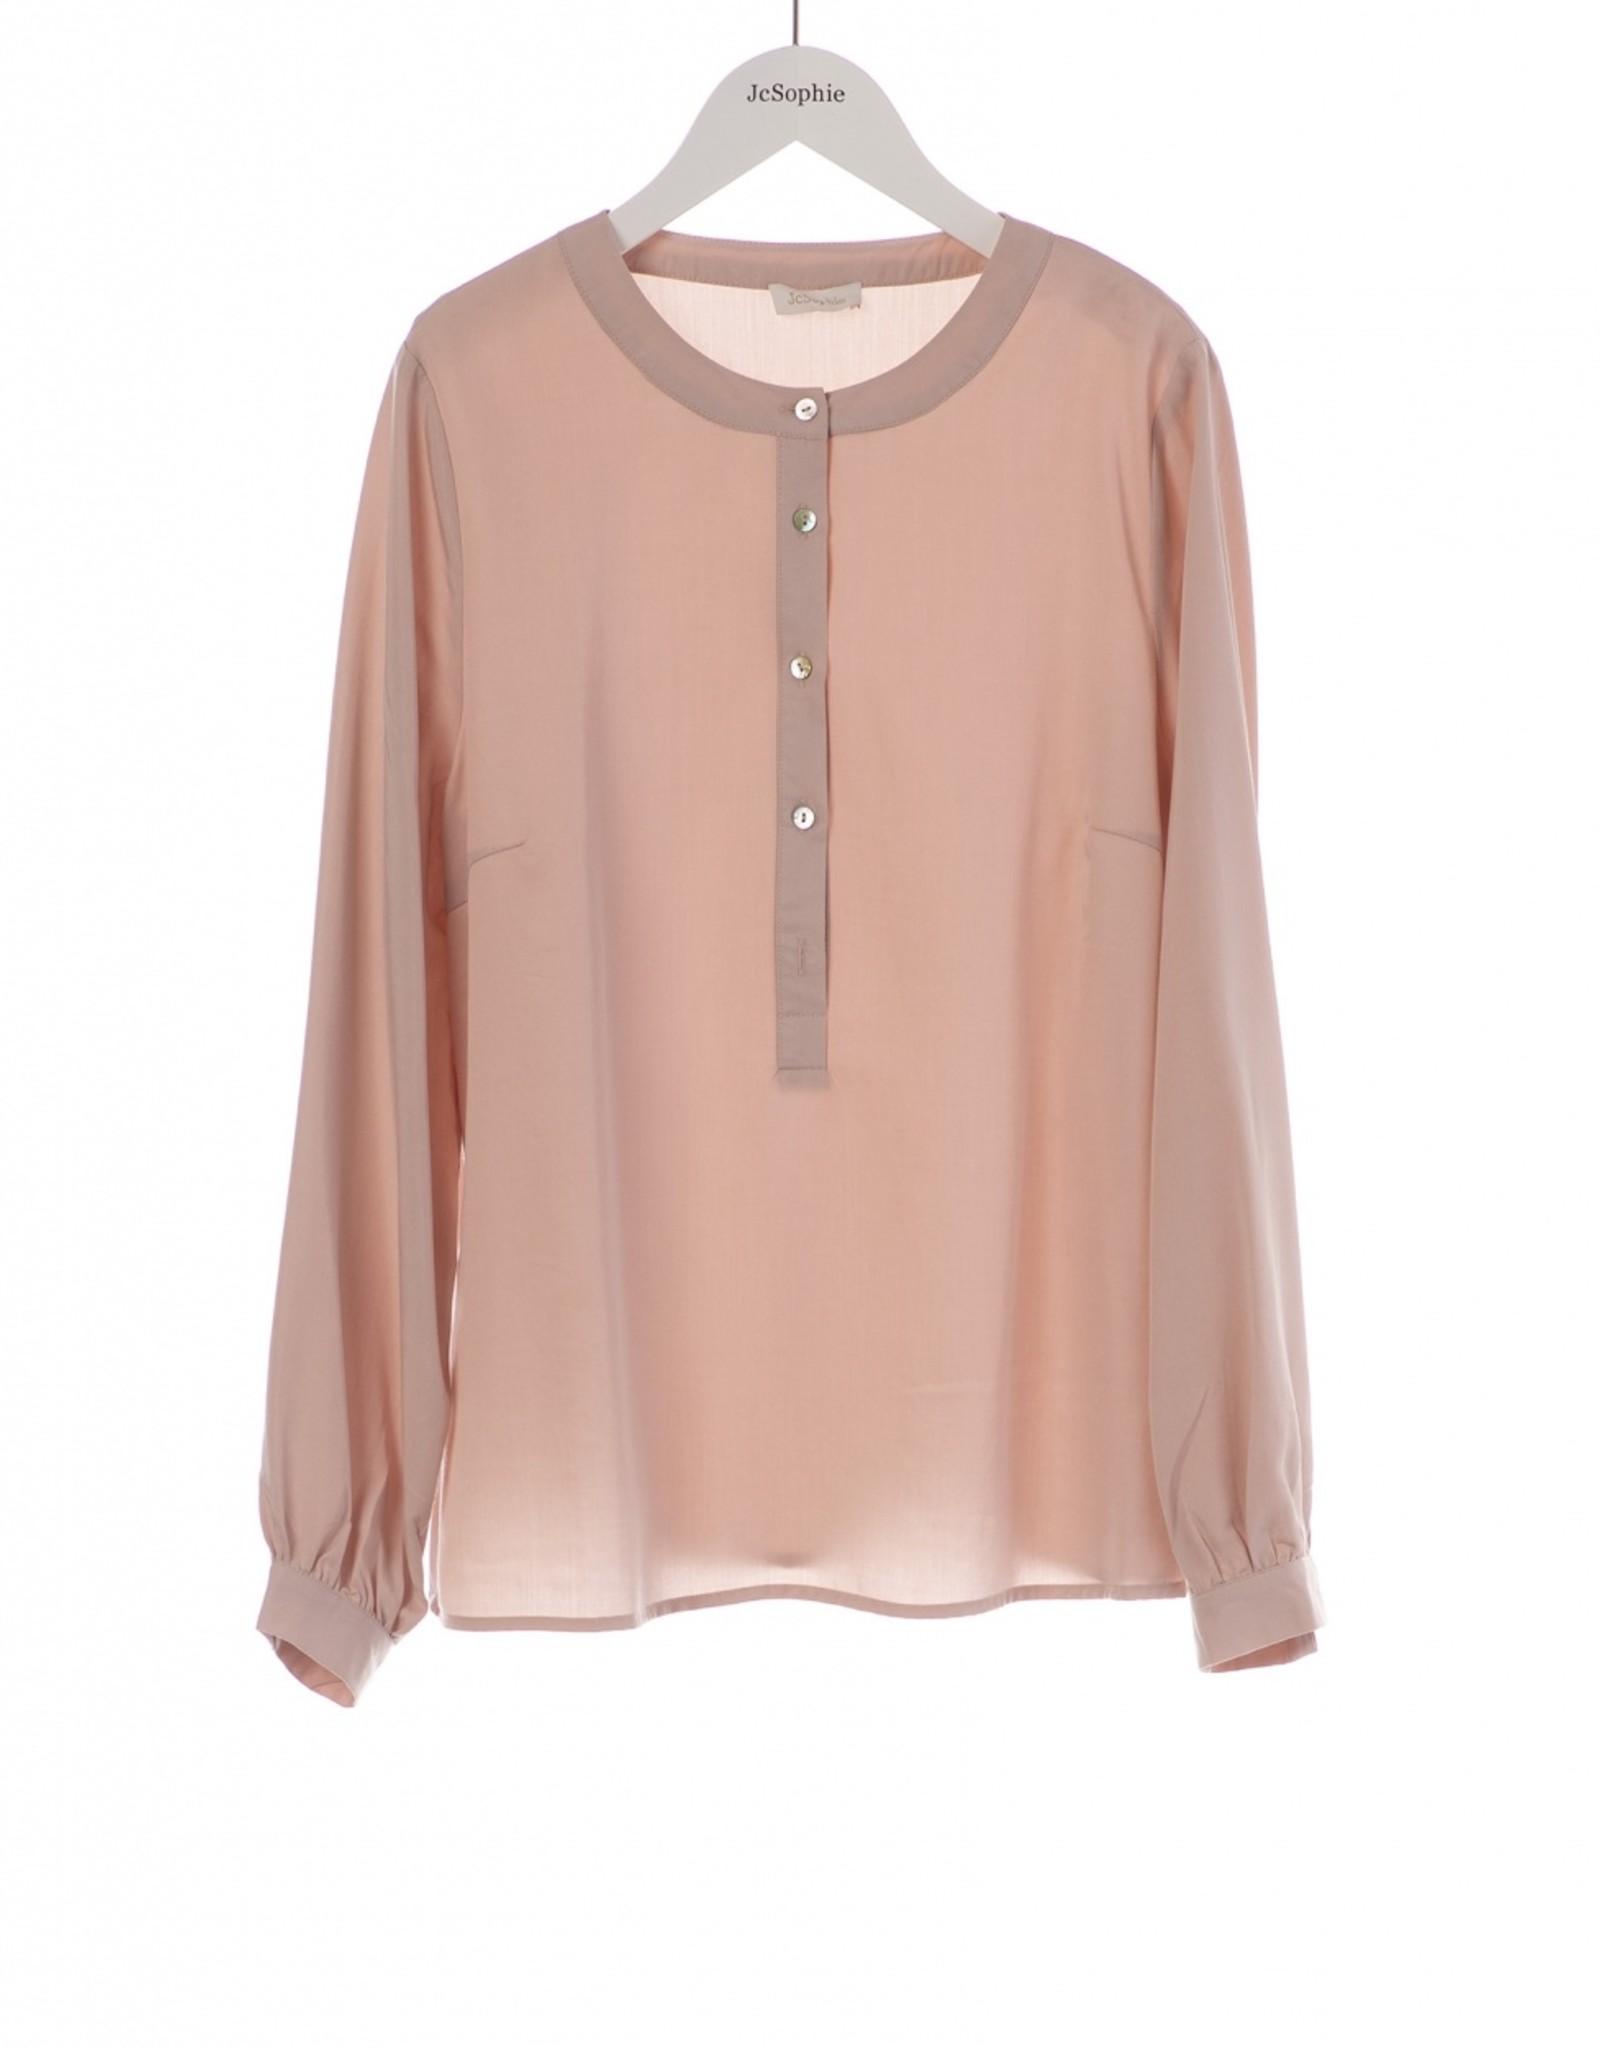 JcSophie Blouse Kensington Blush Pink